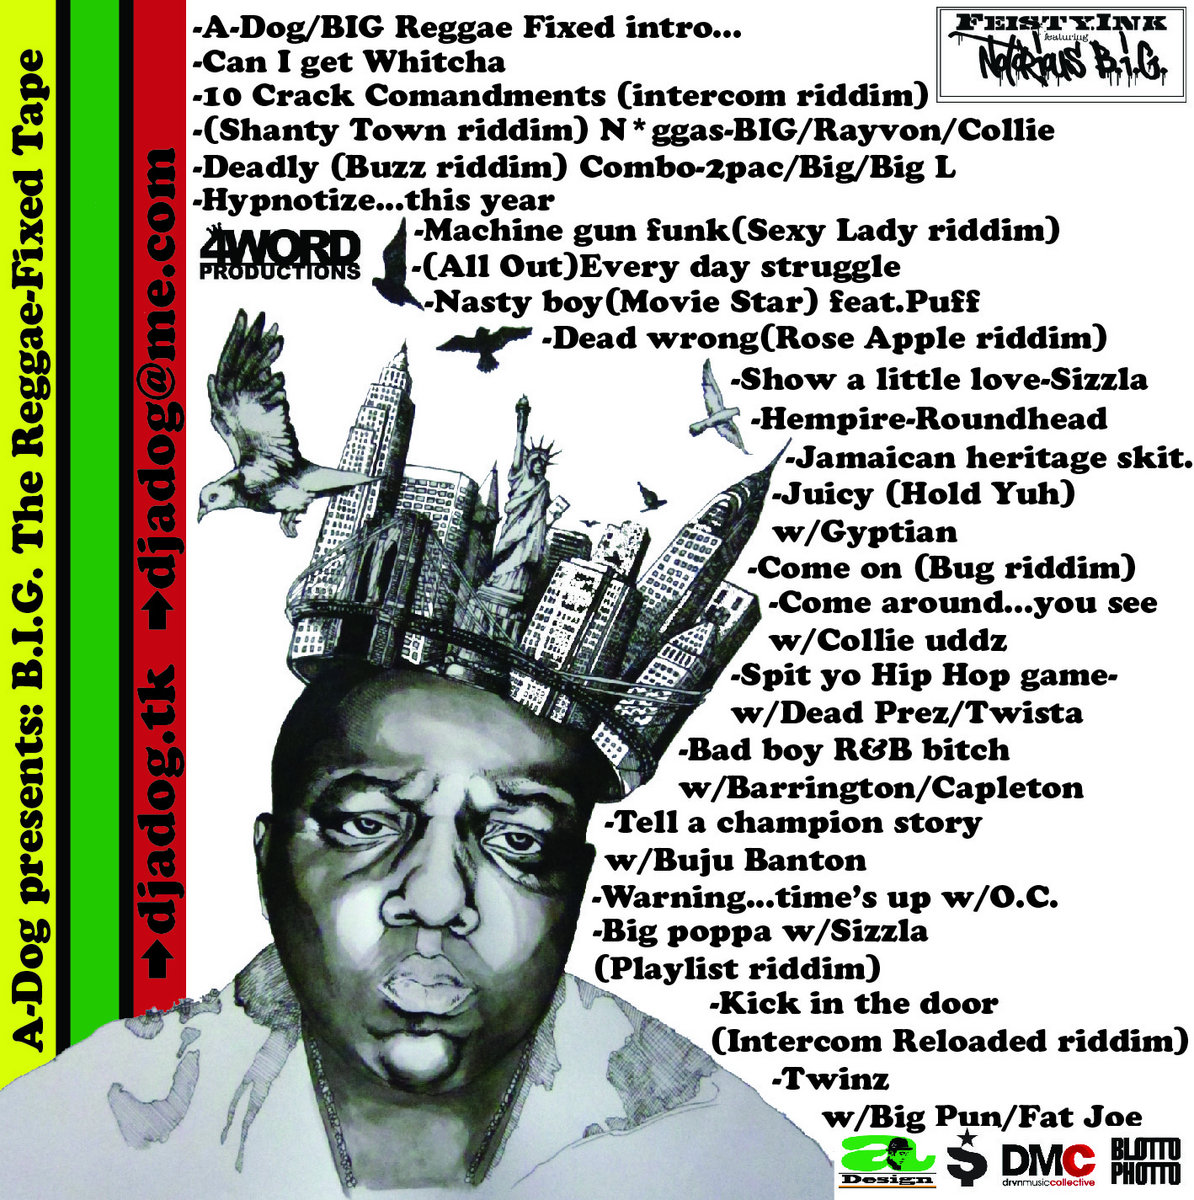 BIG The Reggae Fixed Tape